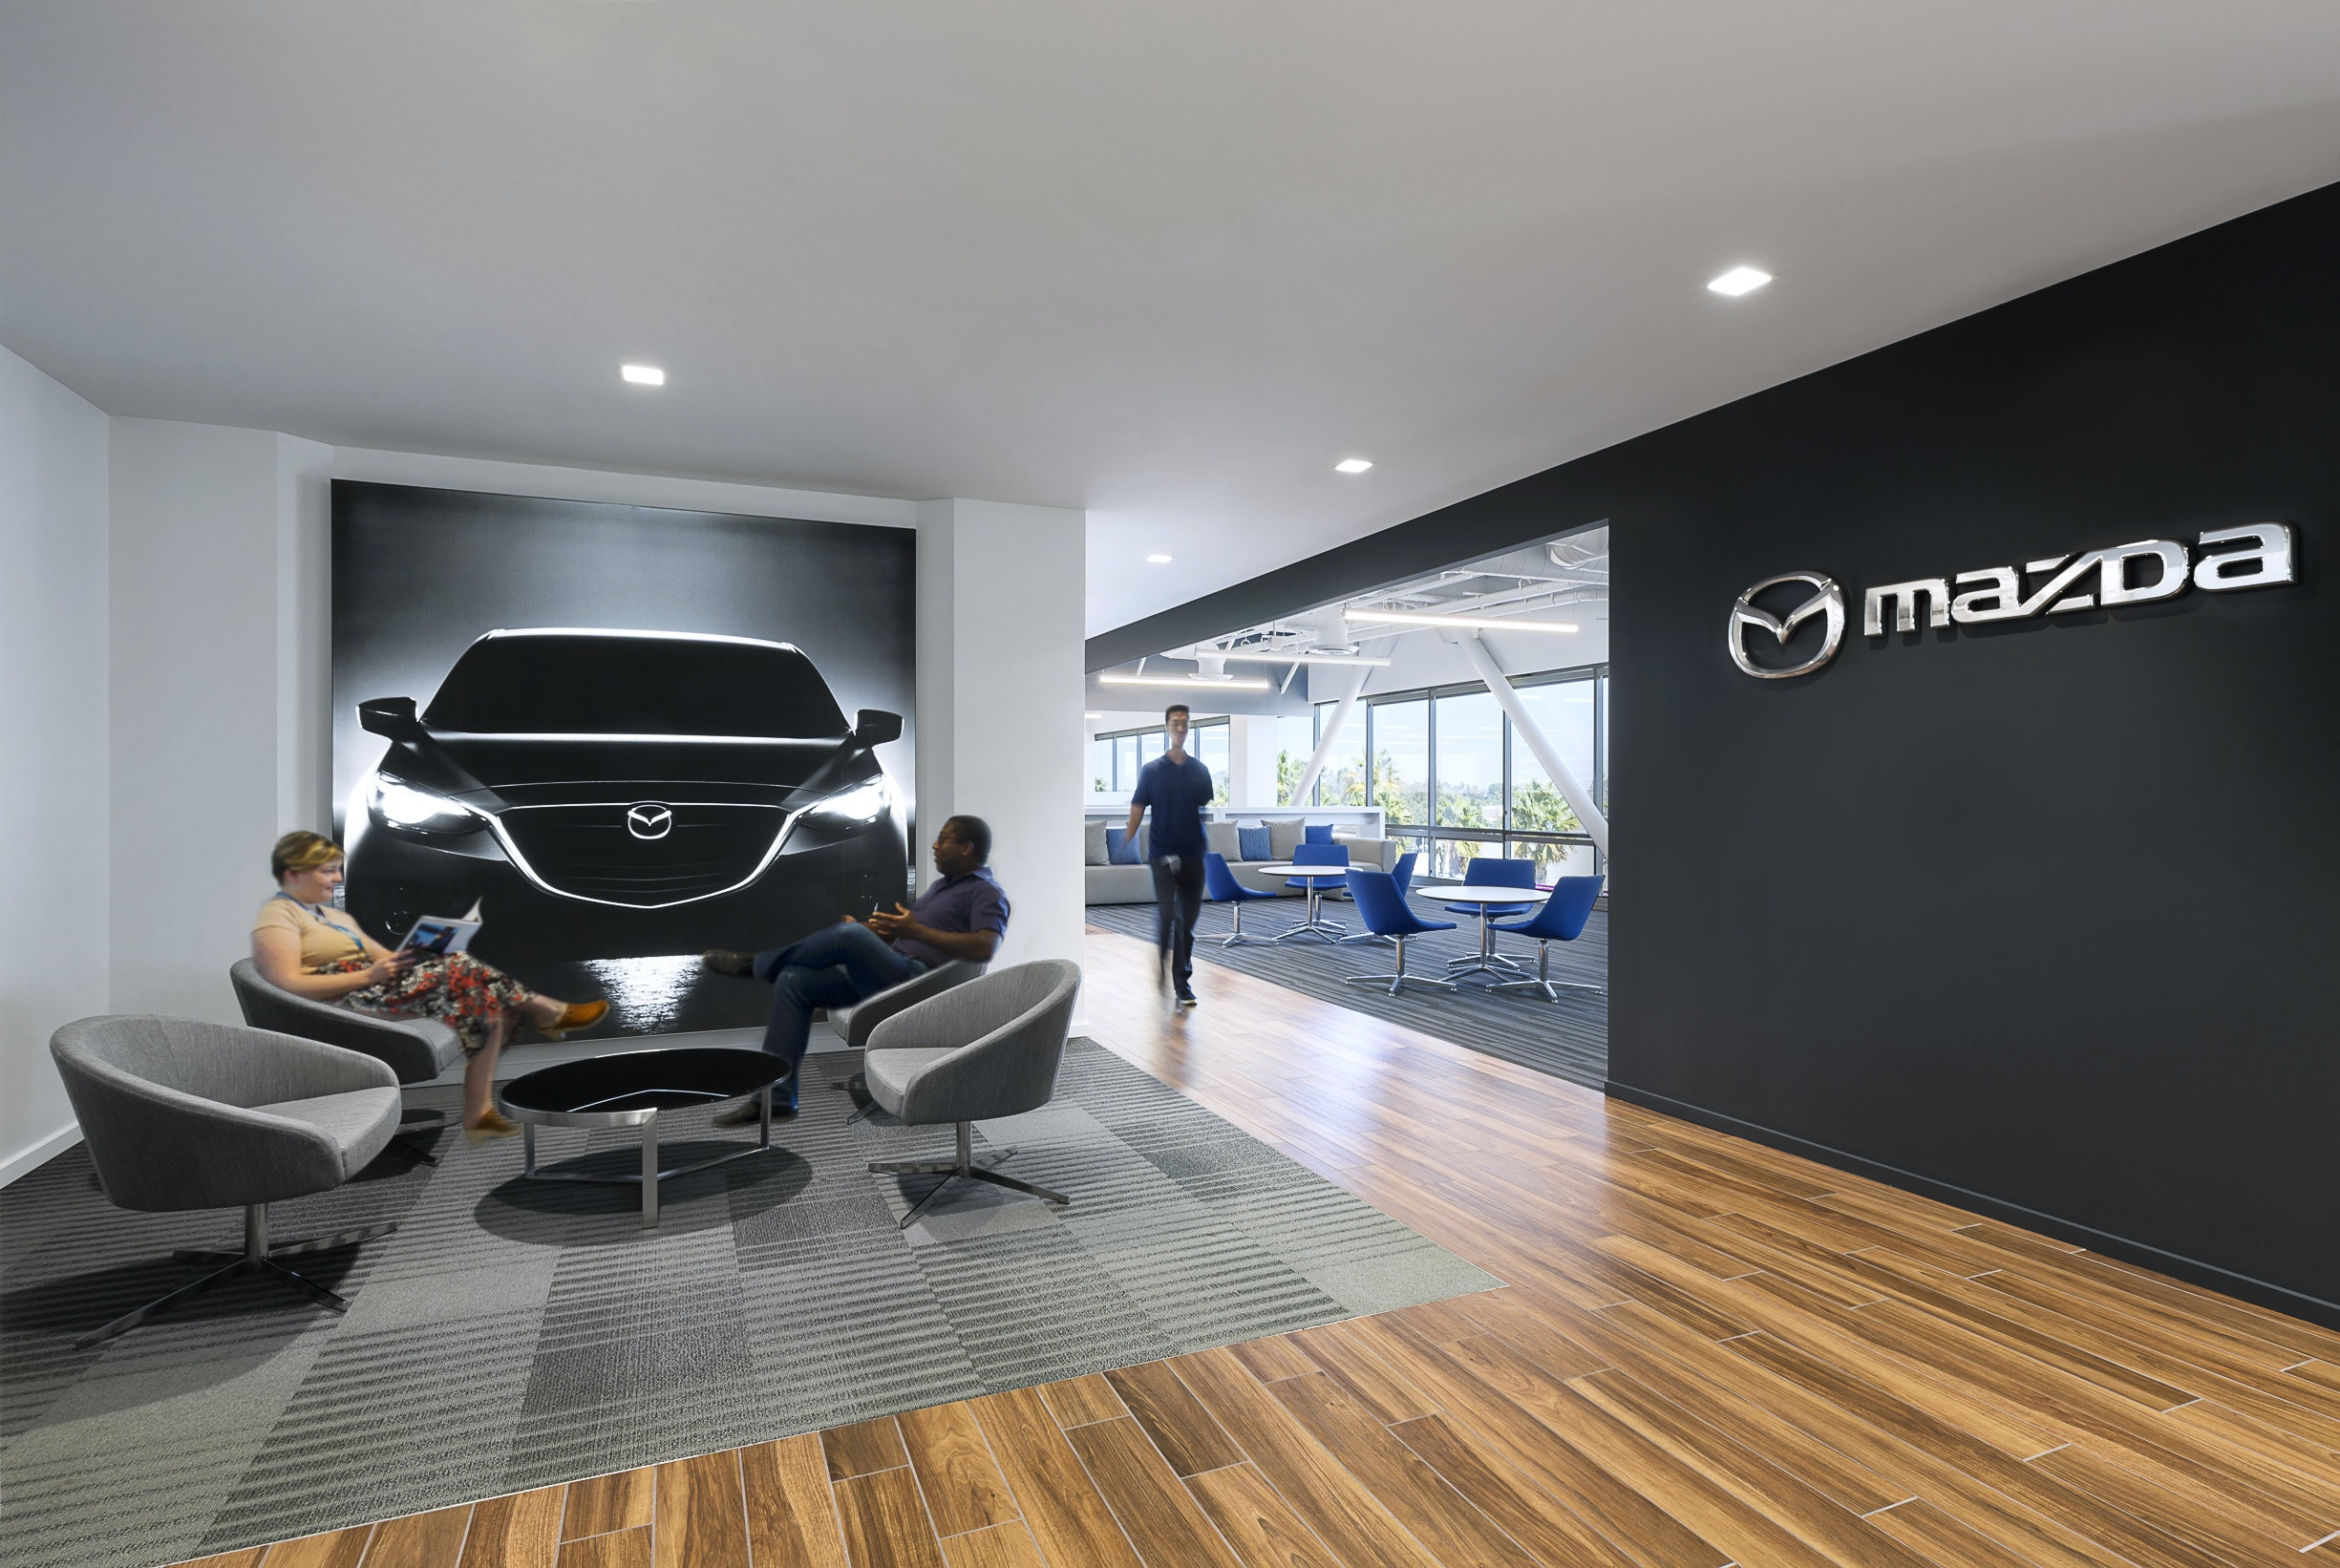 Mazda Western Region Uses Strategic Interior Updates